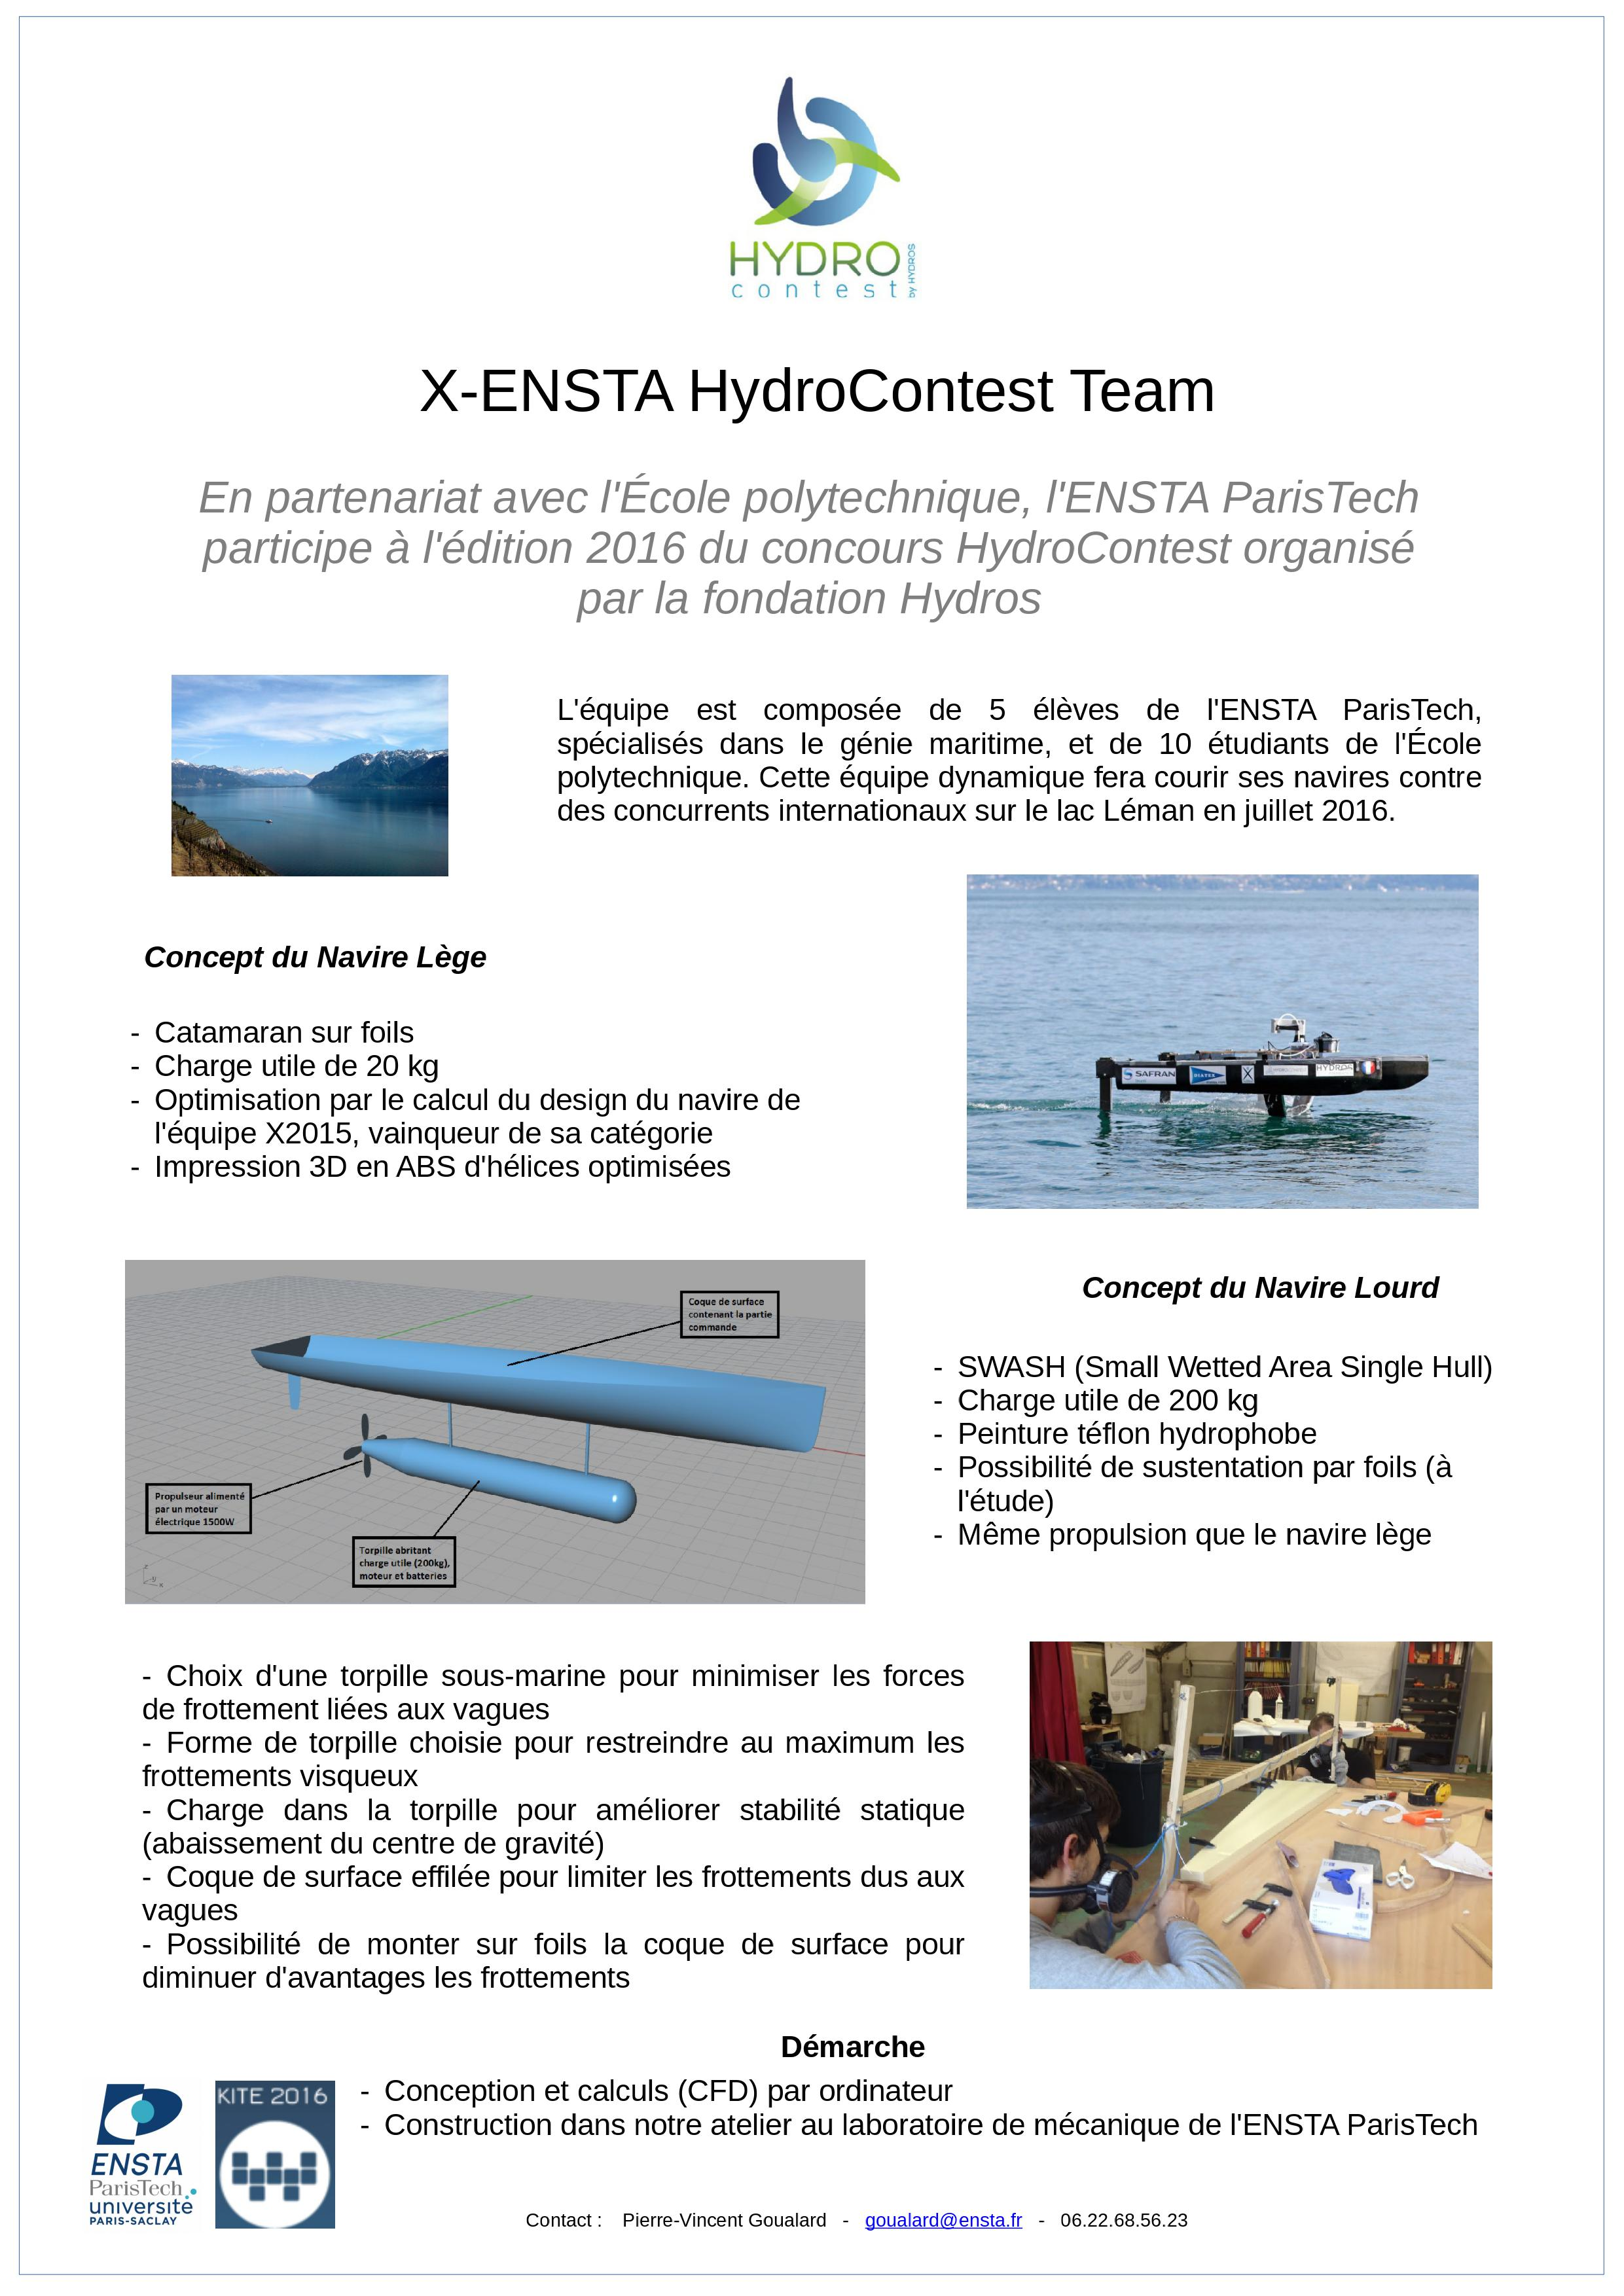 Hydrocontest